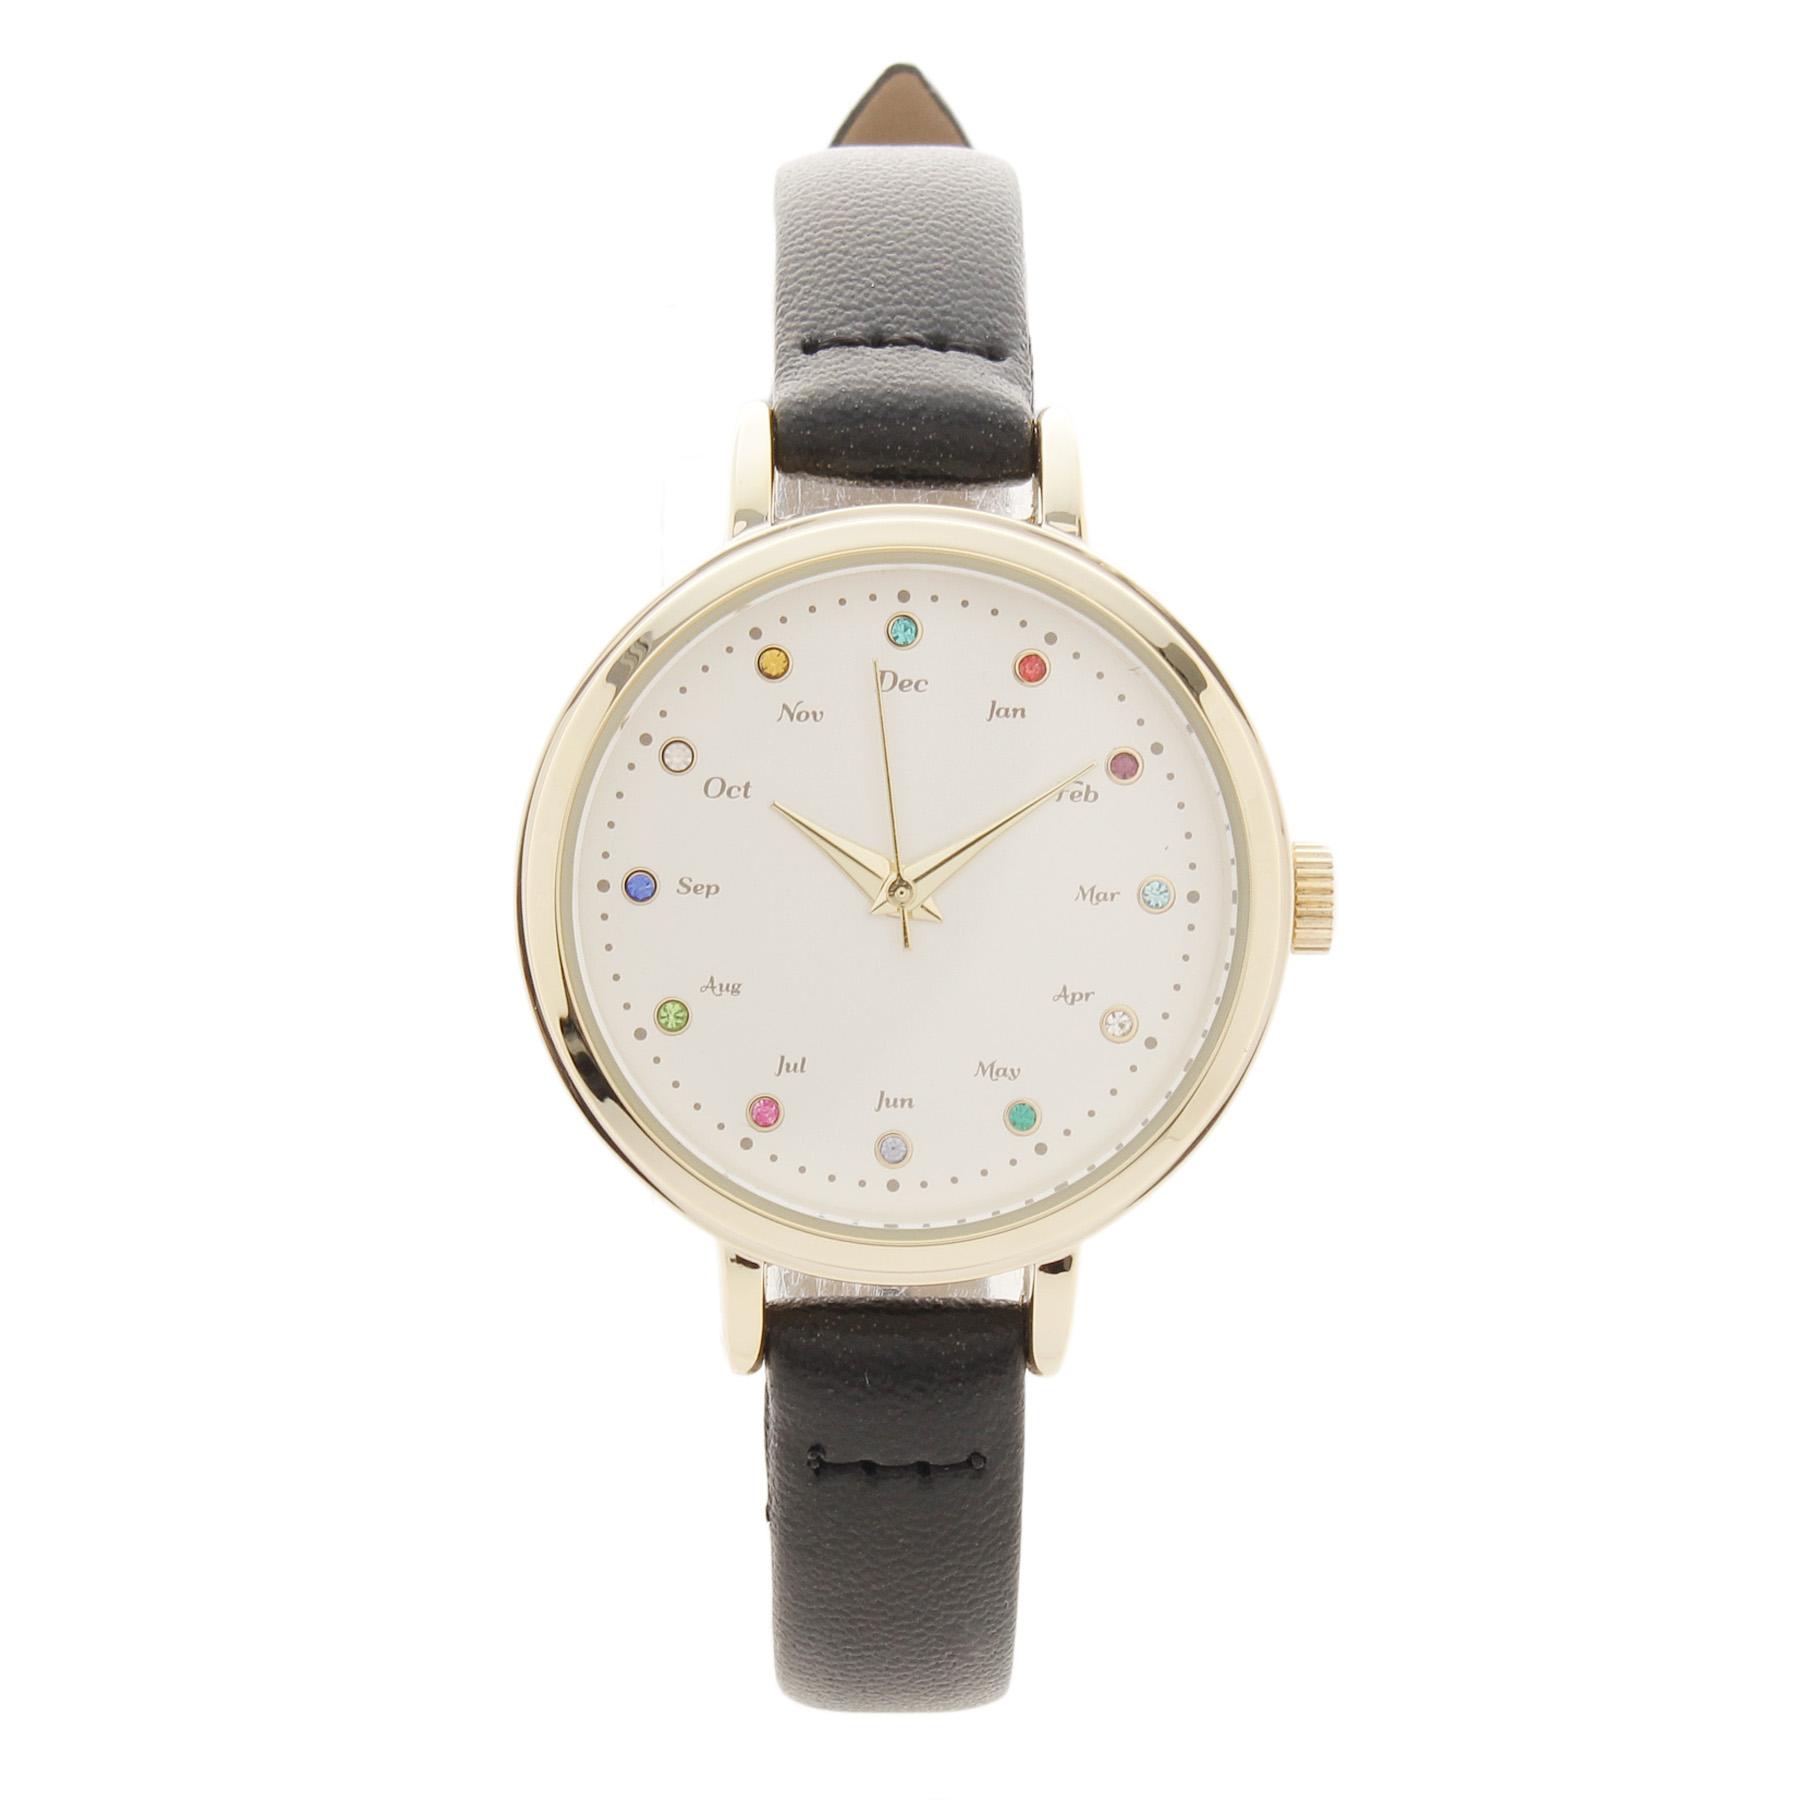 【passage mignon (パサージュ ミニョン)】誕生石カラーストーンウォッチレディース 雑貨|腕時計 ブラック